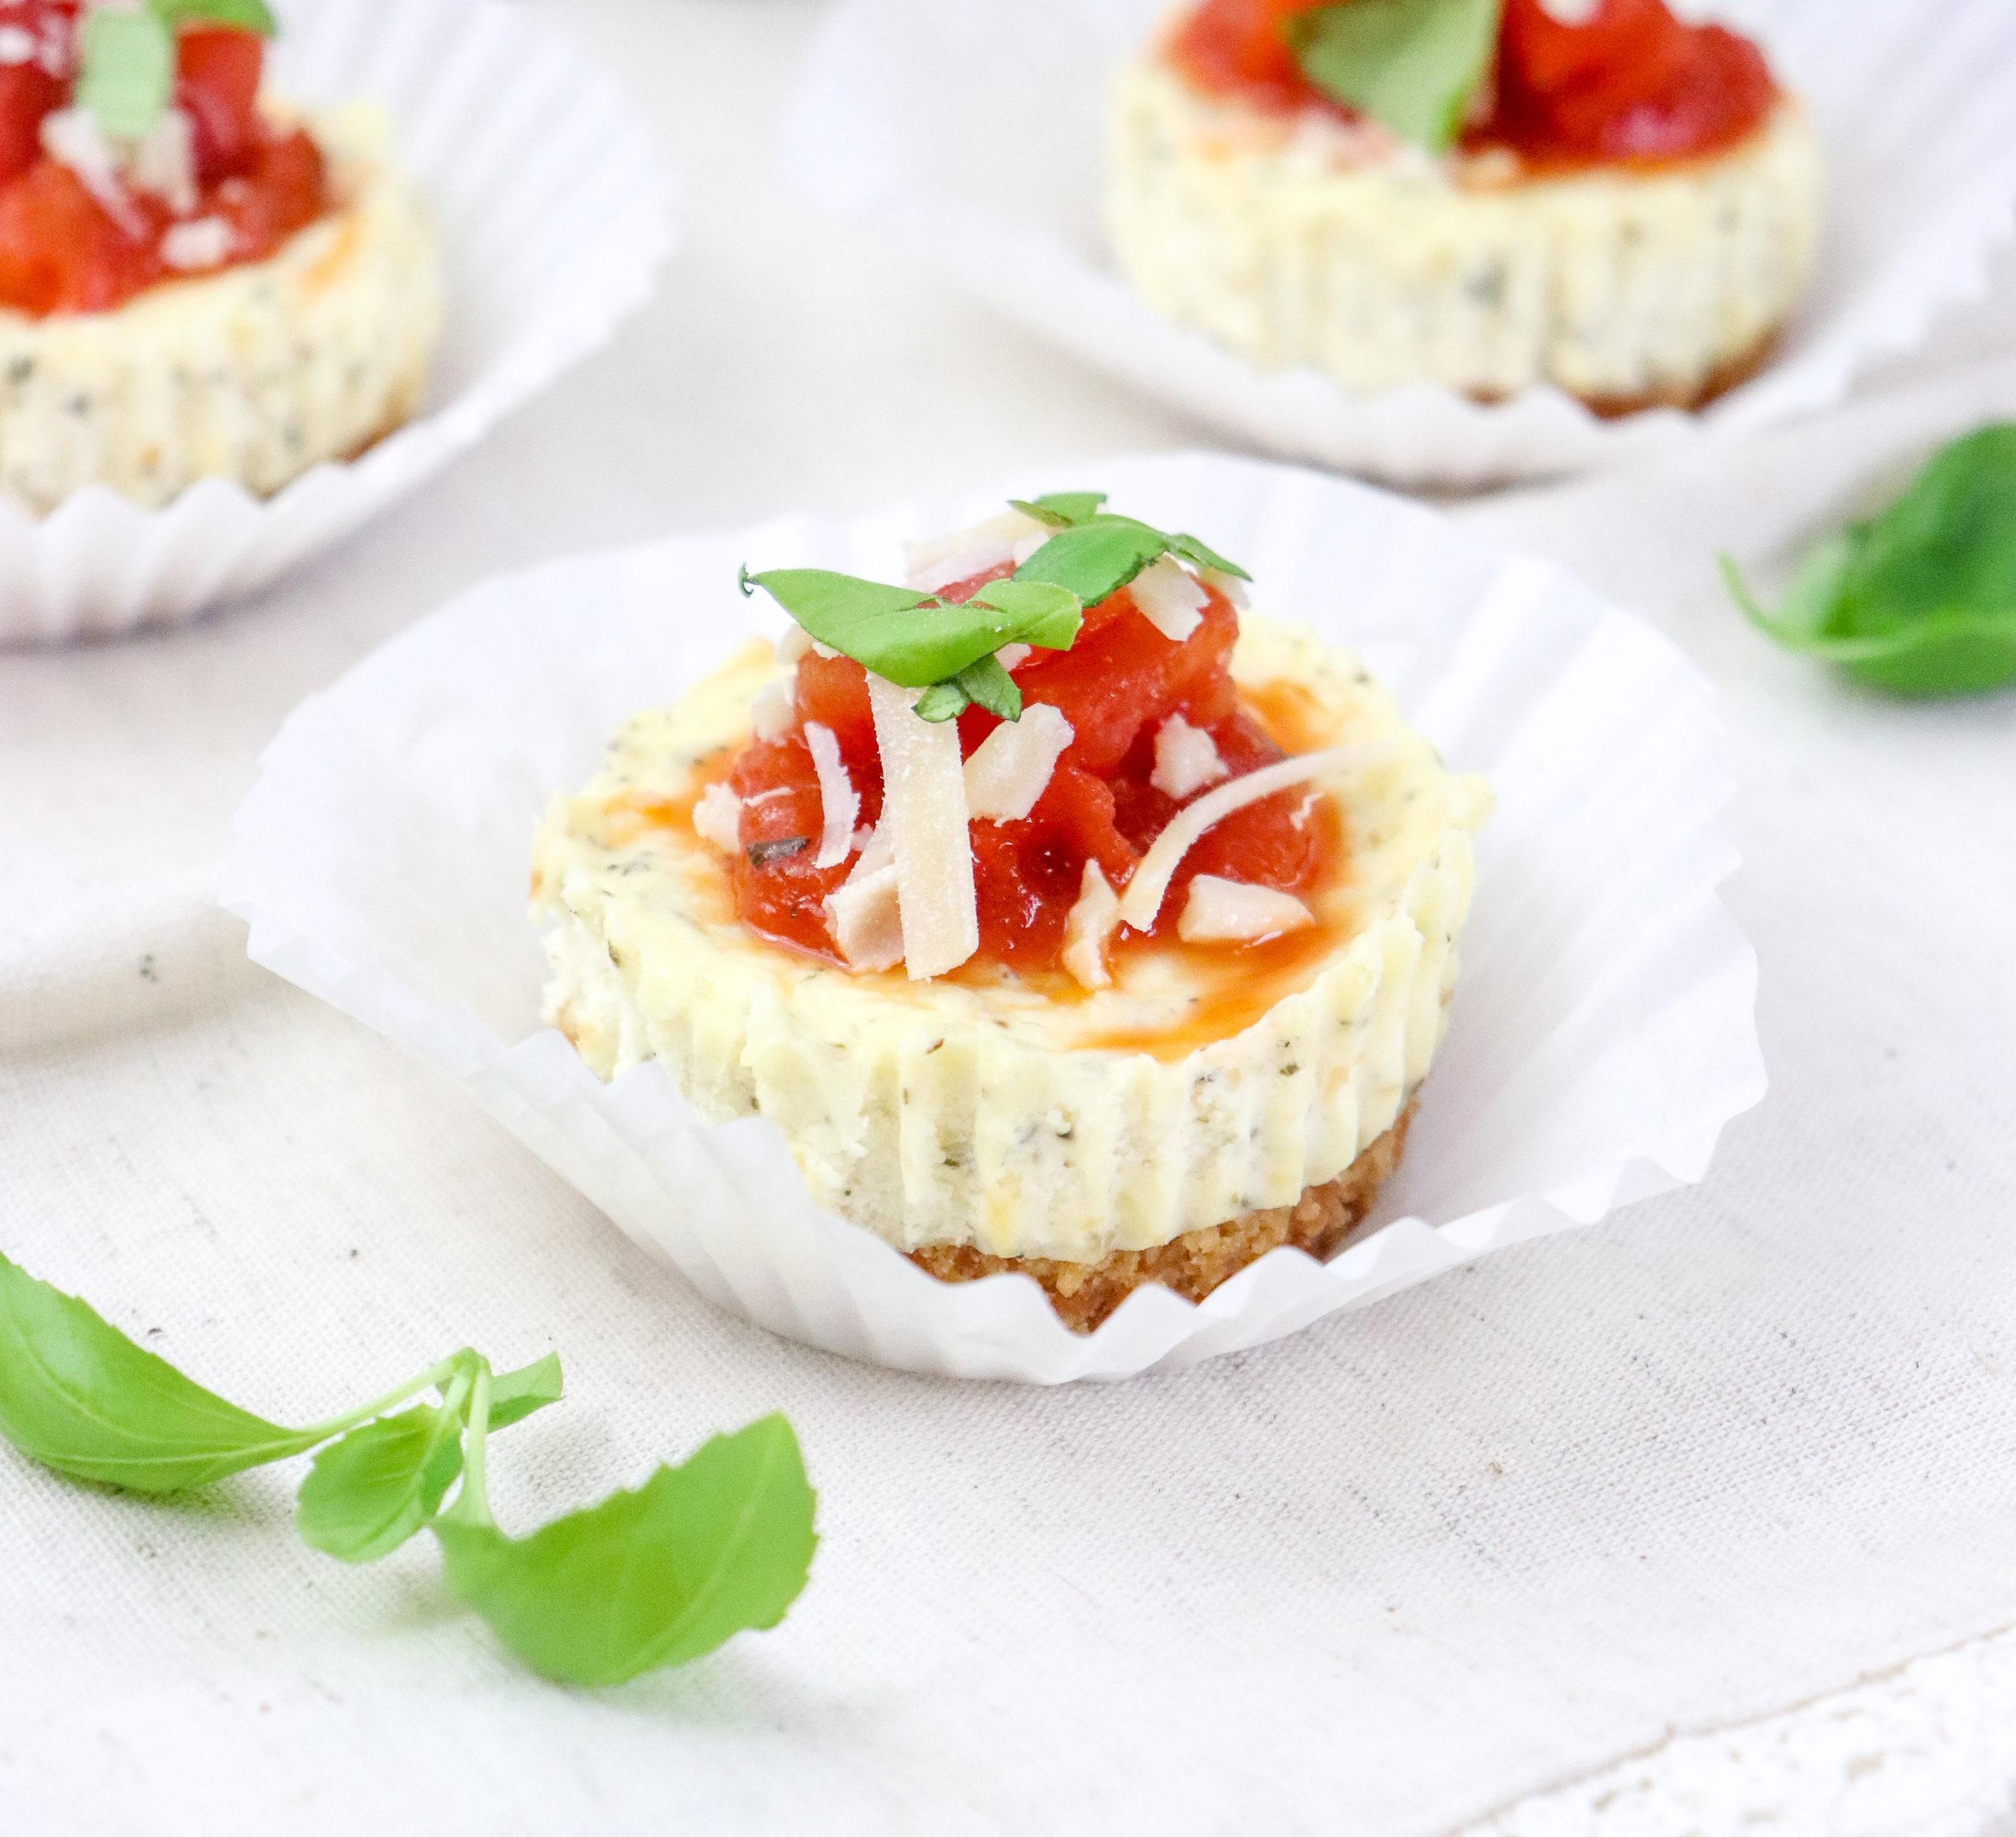 Mini Savory Italian Cheesecakes